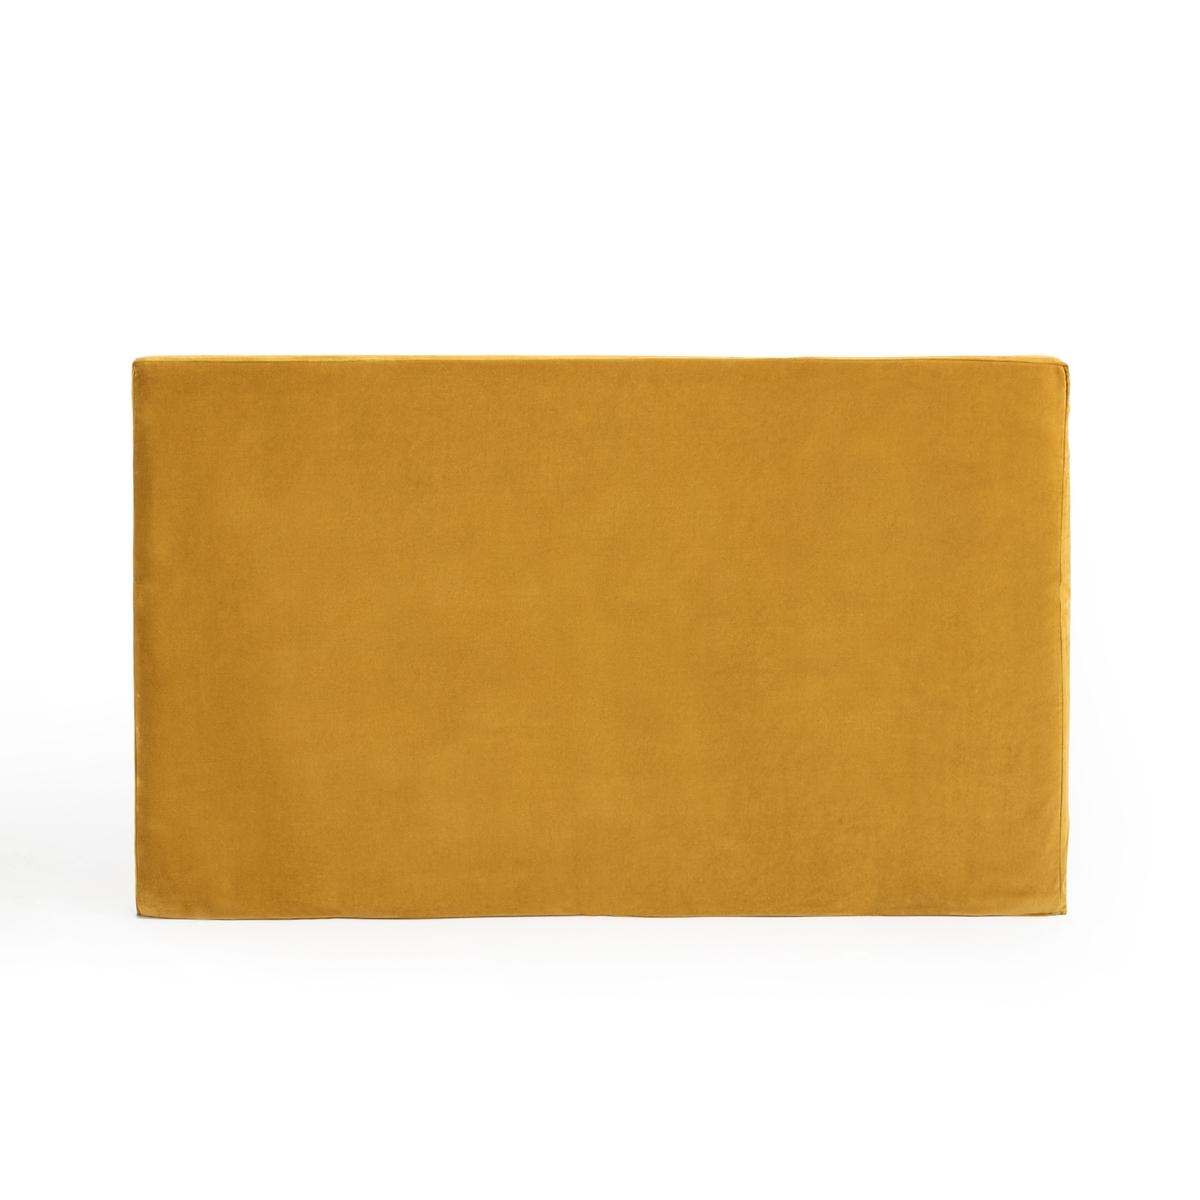 Чехол LaRedoute Для изголовья кровати из велюра Velvet 160 x 85 см желтый чехол laredoute для изголовья кровати stadia 100 лен высота 120 см 120 x 10 x 160 см серый